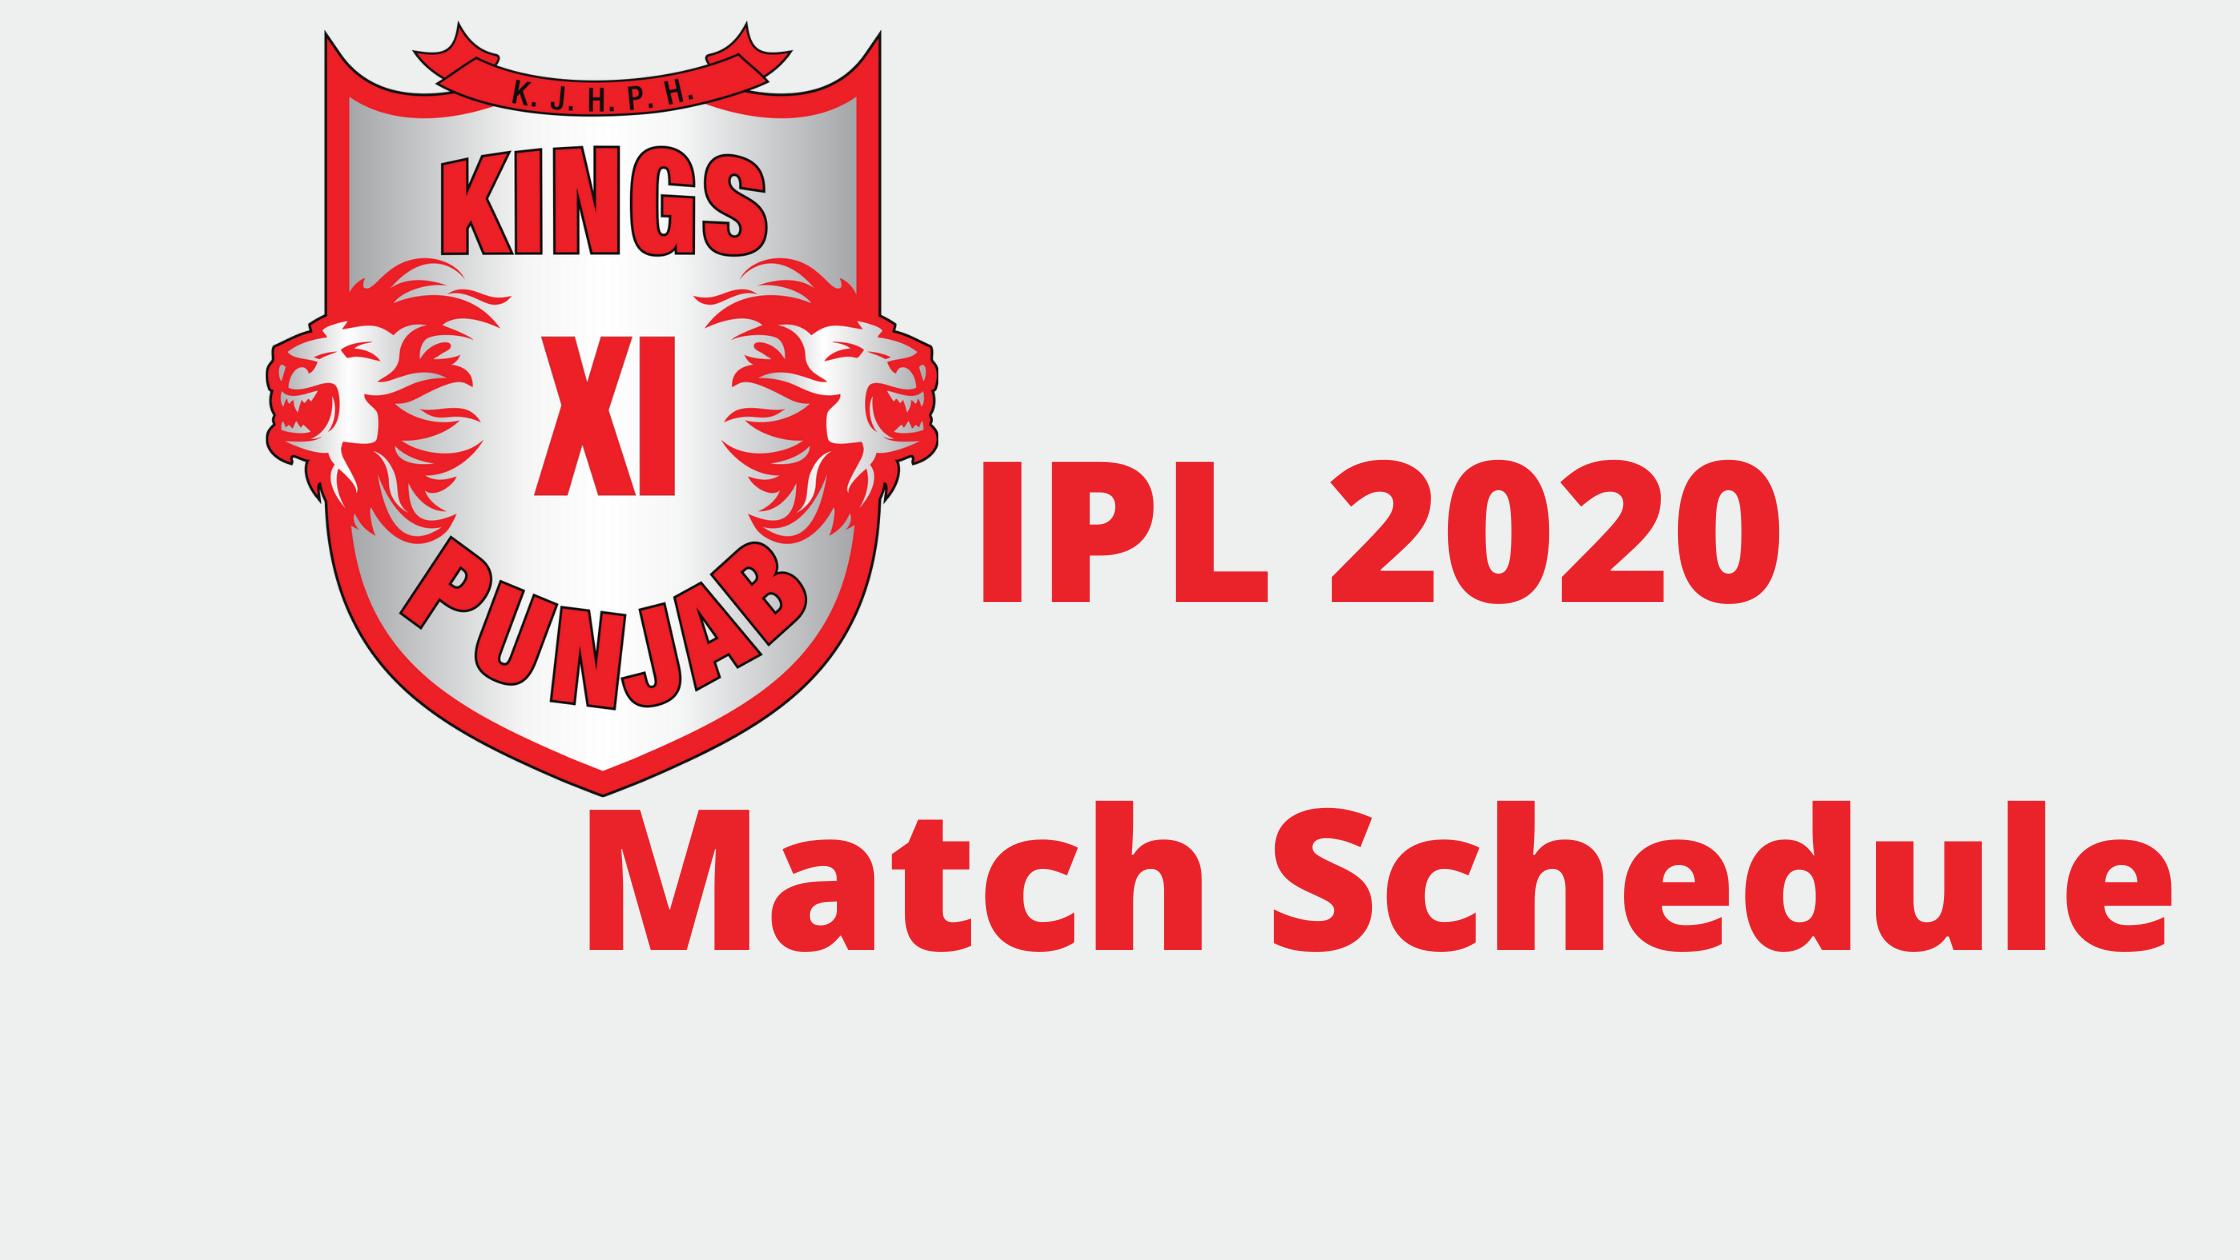 Dream11 IPL 2020 Kings XI Punjab Match Schedule